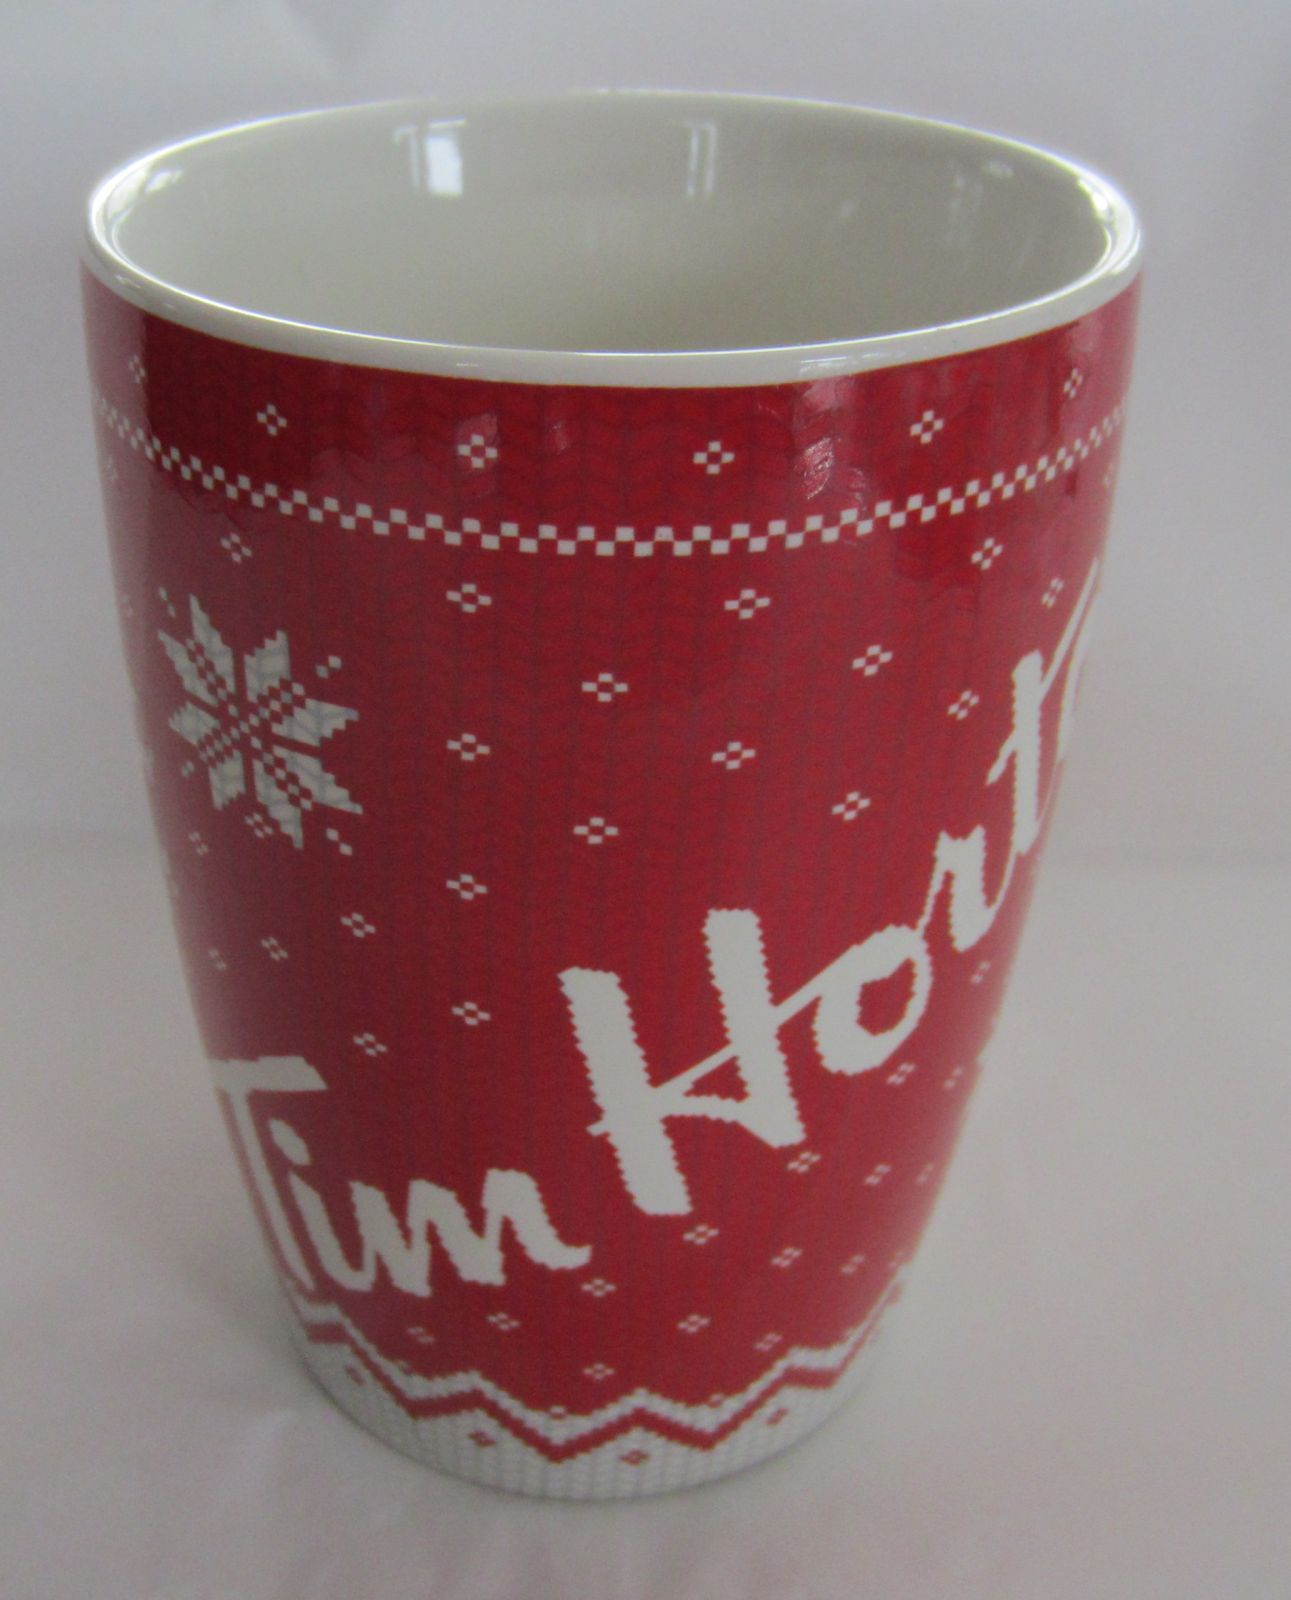 2015 Tim Hortons 015 Christmas Sweater Snowflake 16 Oz